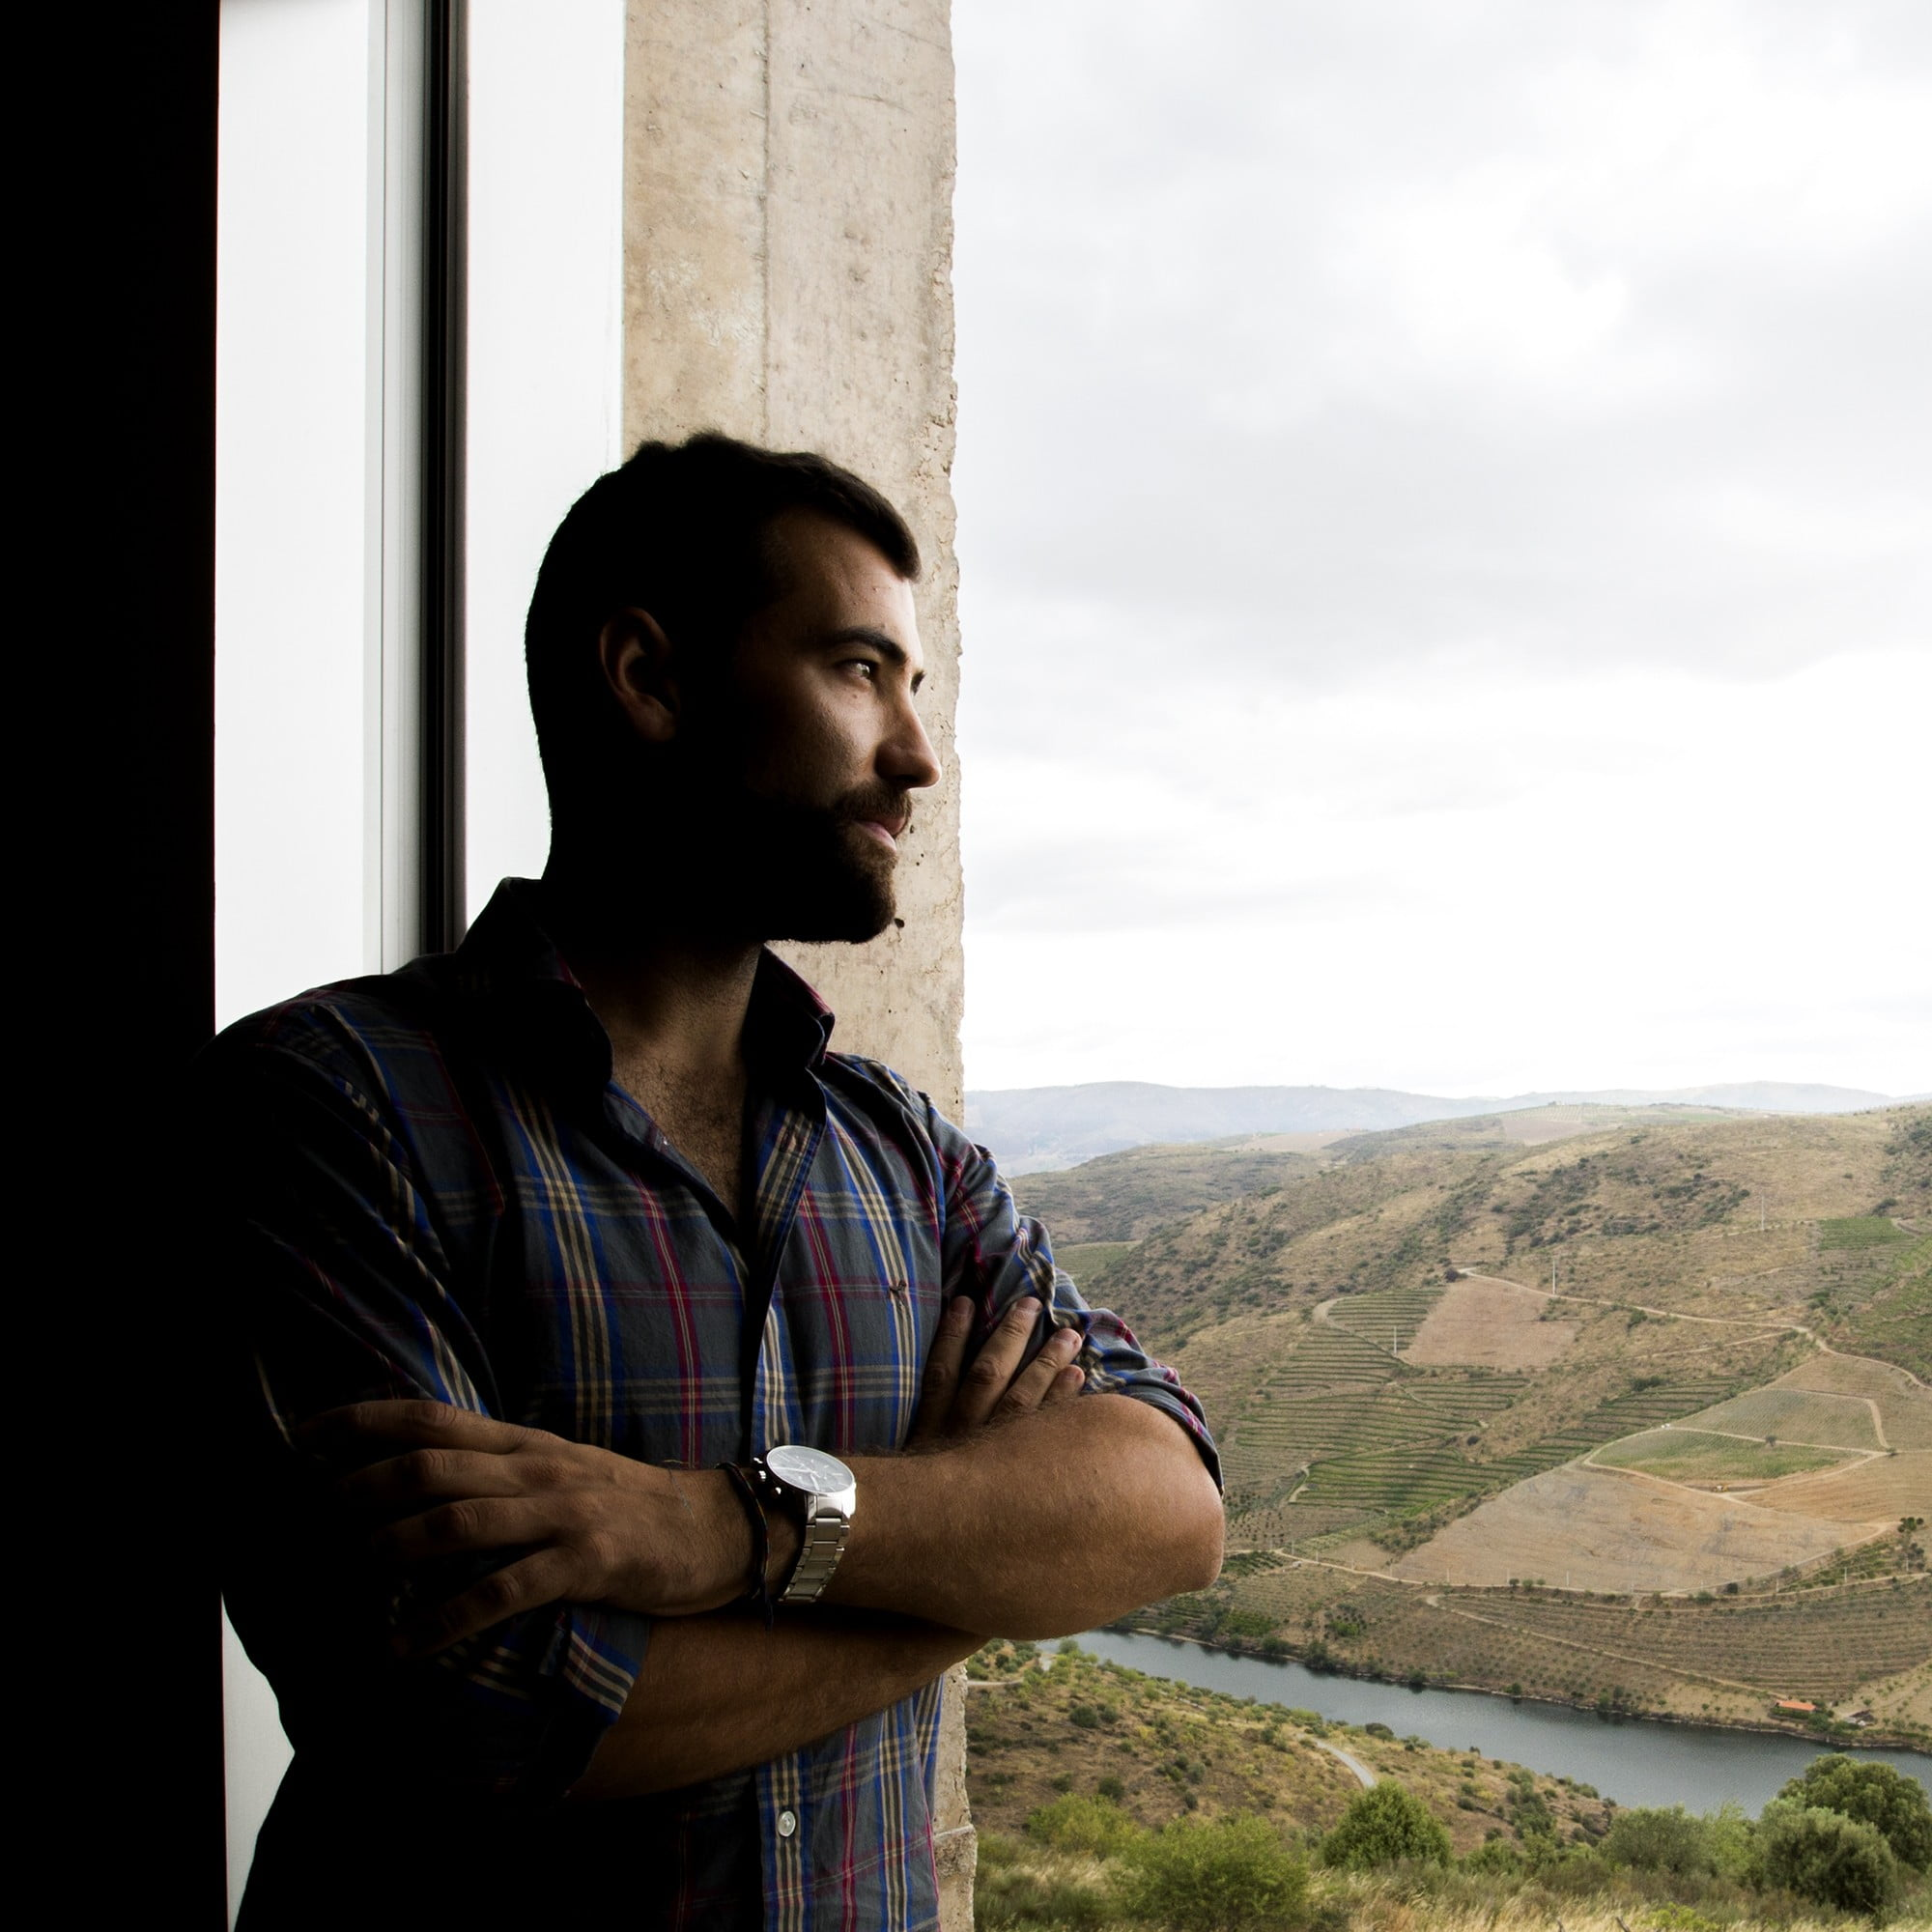 Rui Manuel Ferreira